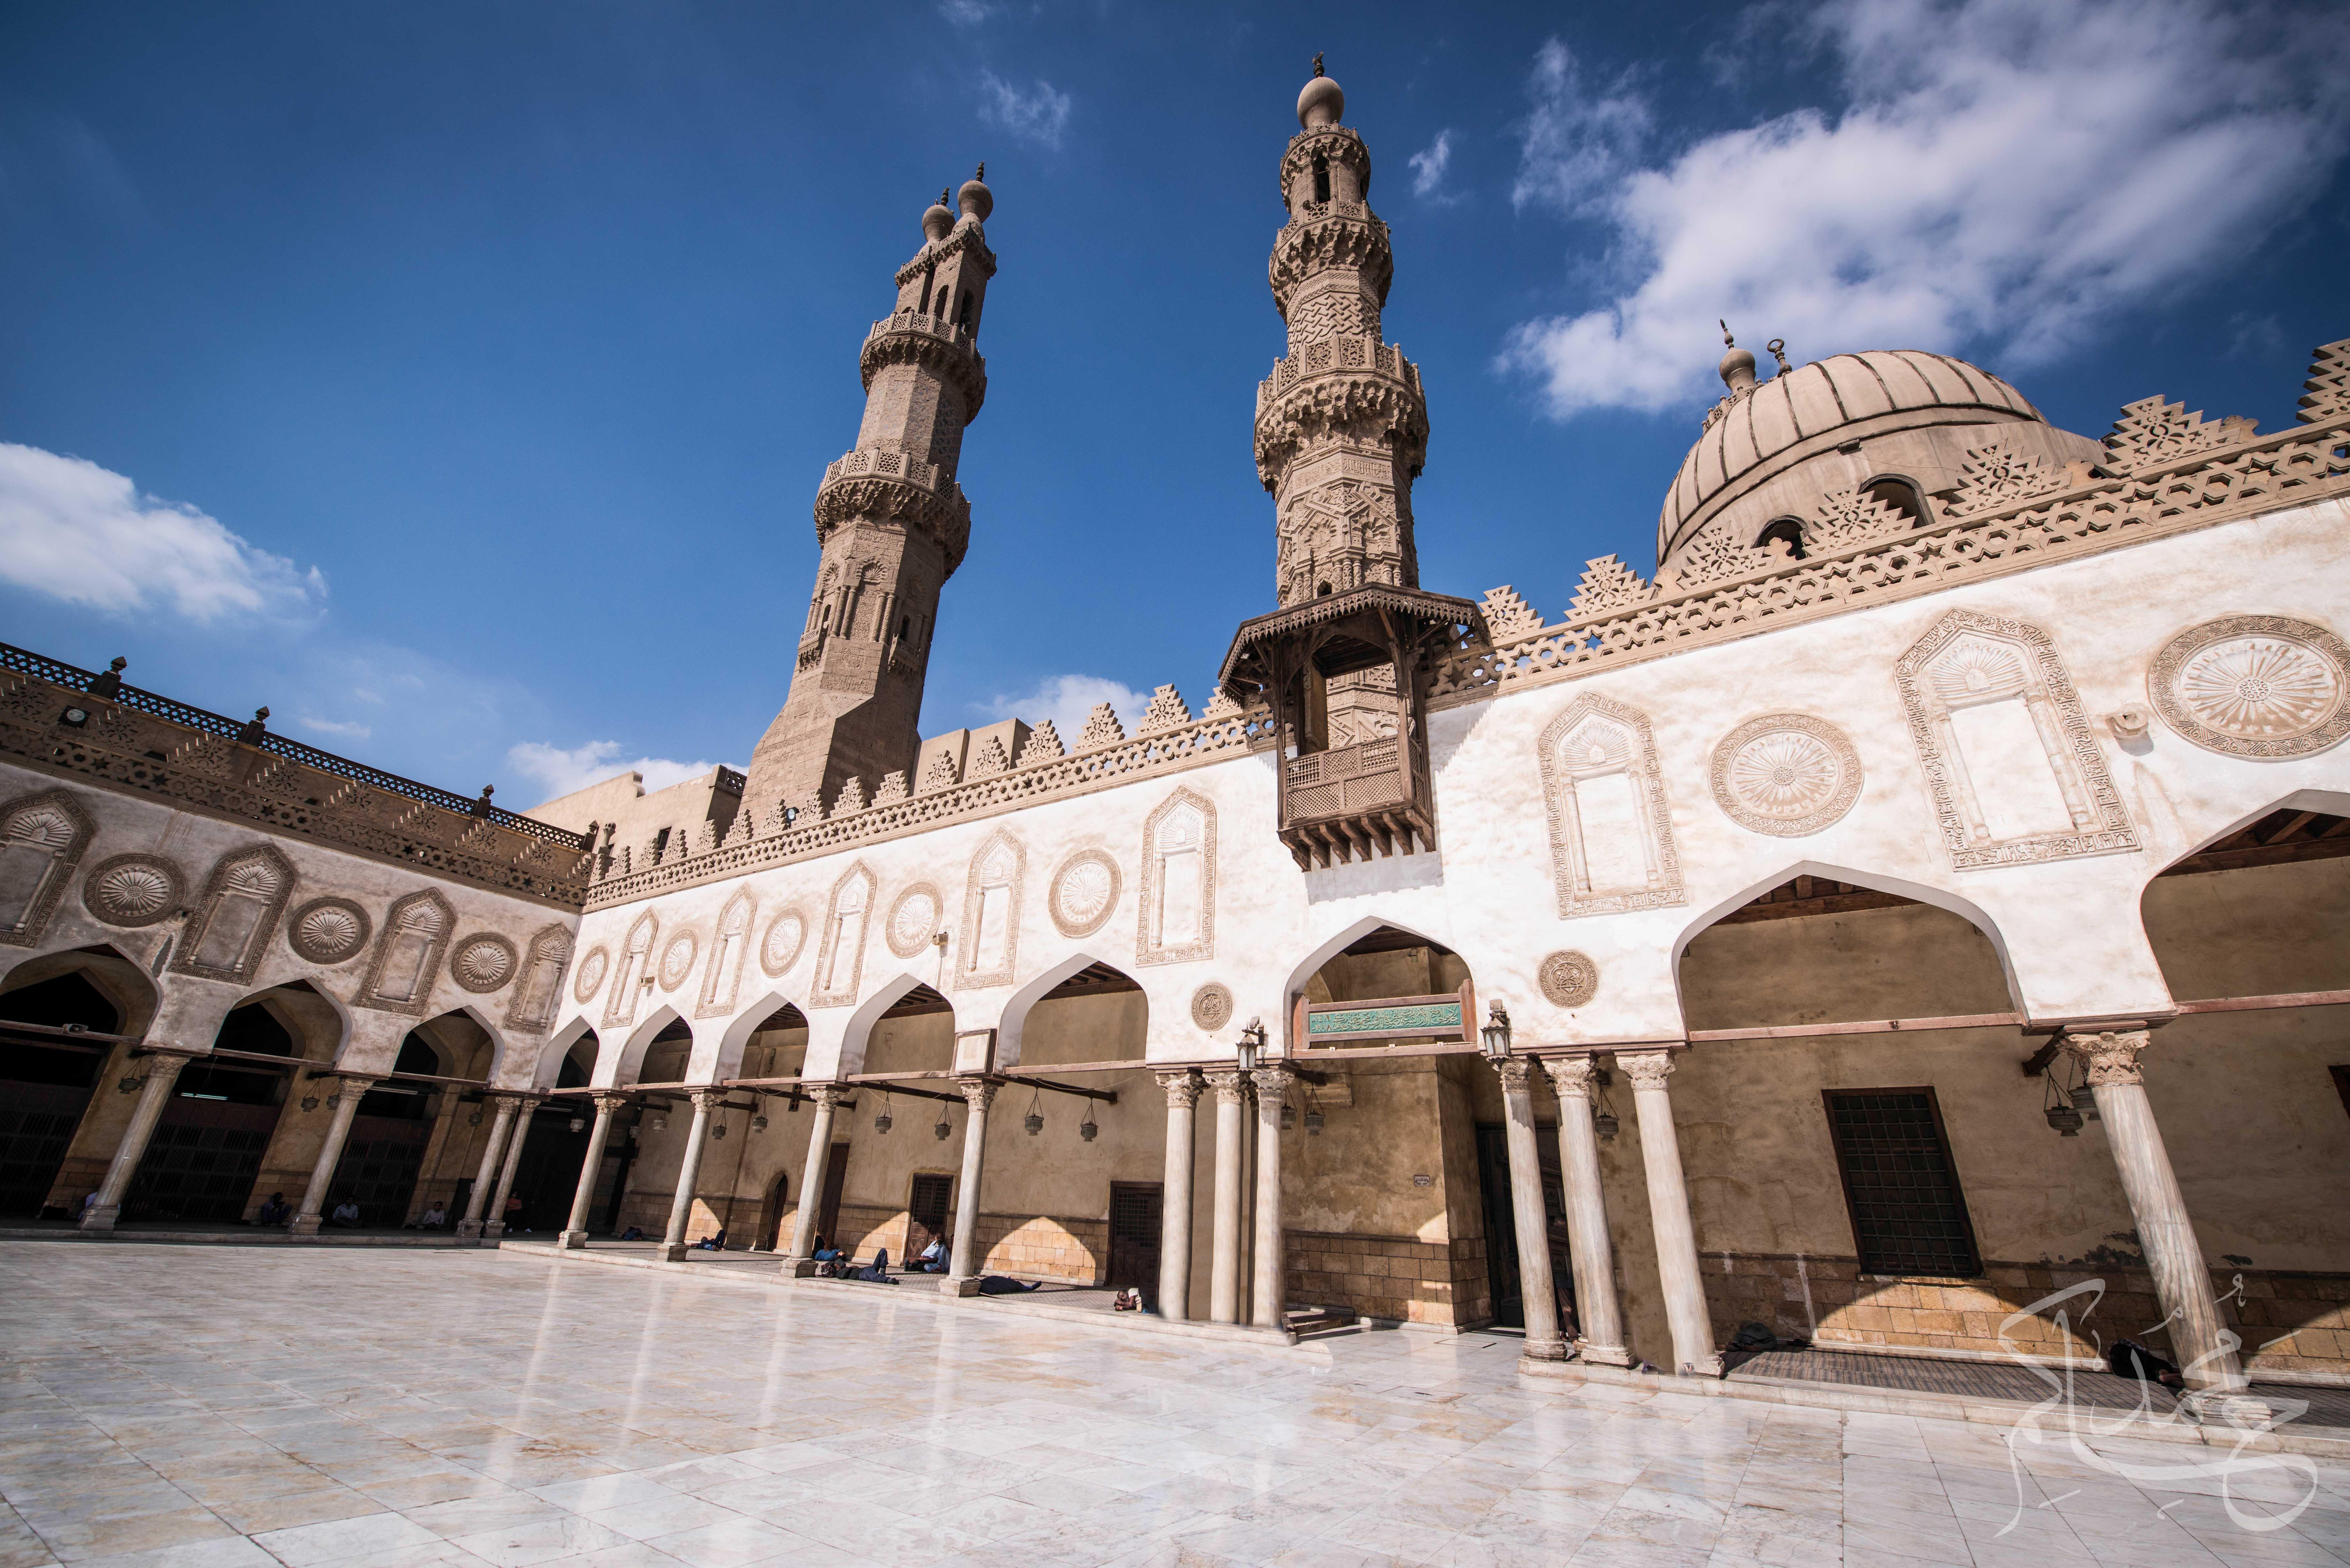 Al Azhar Mosque. (Image Credit: Mohamed Hakem, via egyptianstreets.com)